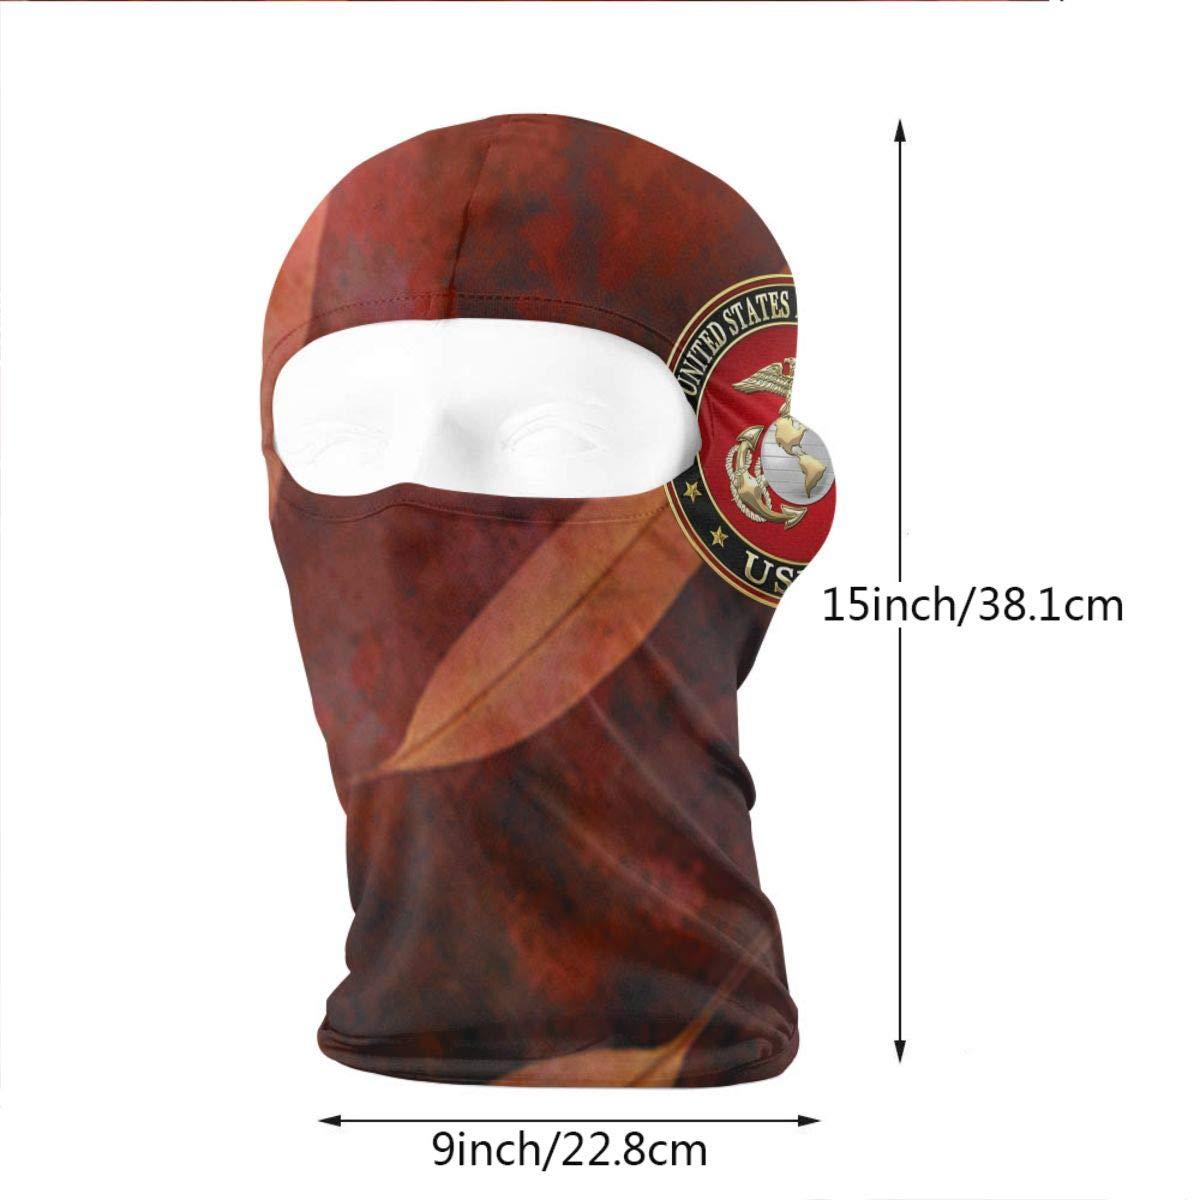 USMC-Eagle Globe and Anchor Full Face Mask Hood for Motorcycle Cycling Bike Hiking Skateboard Balaclava